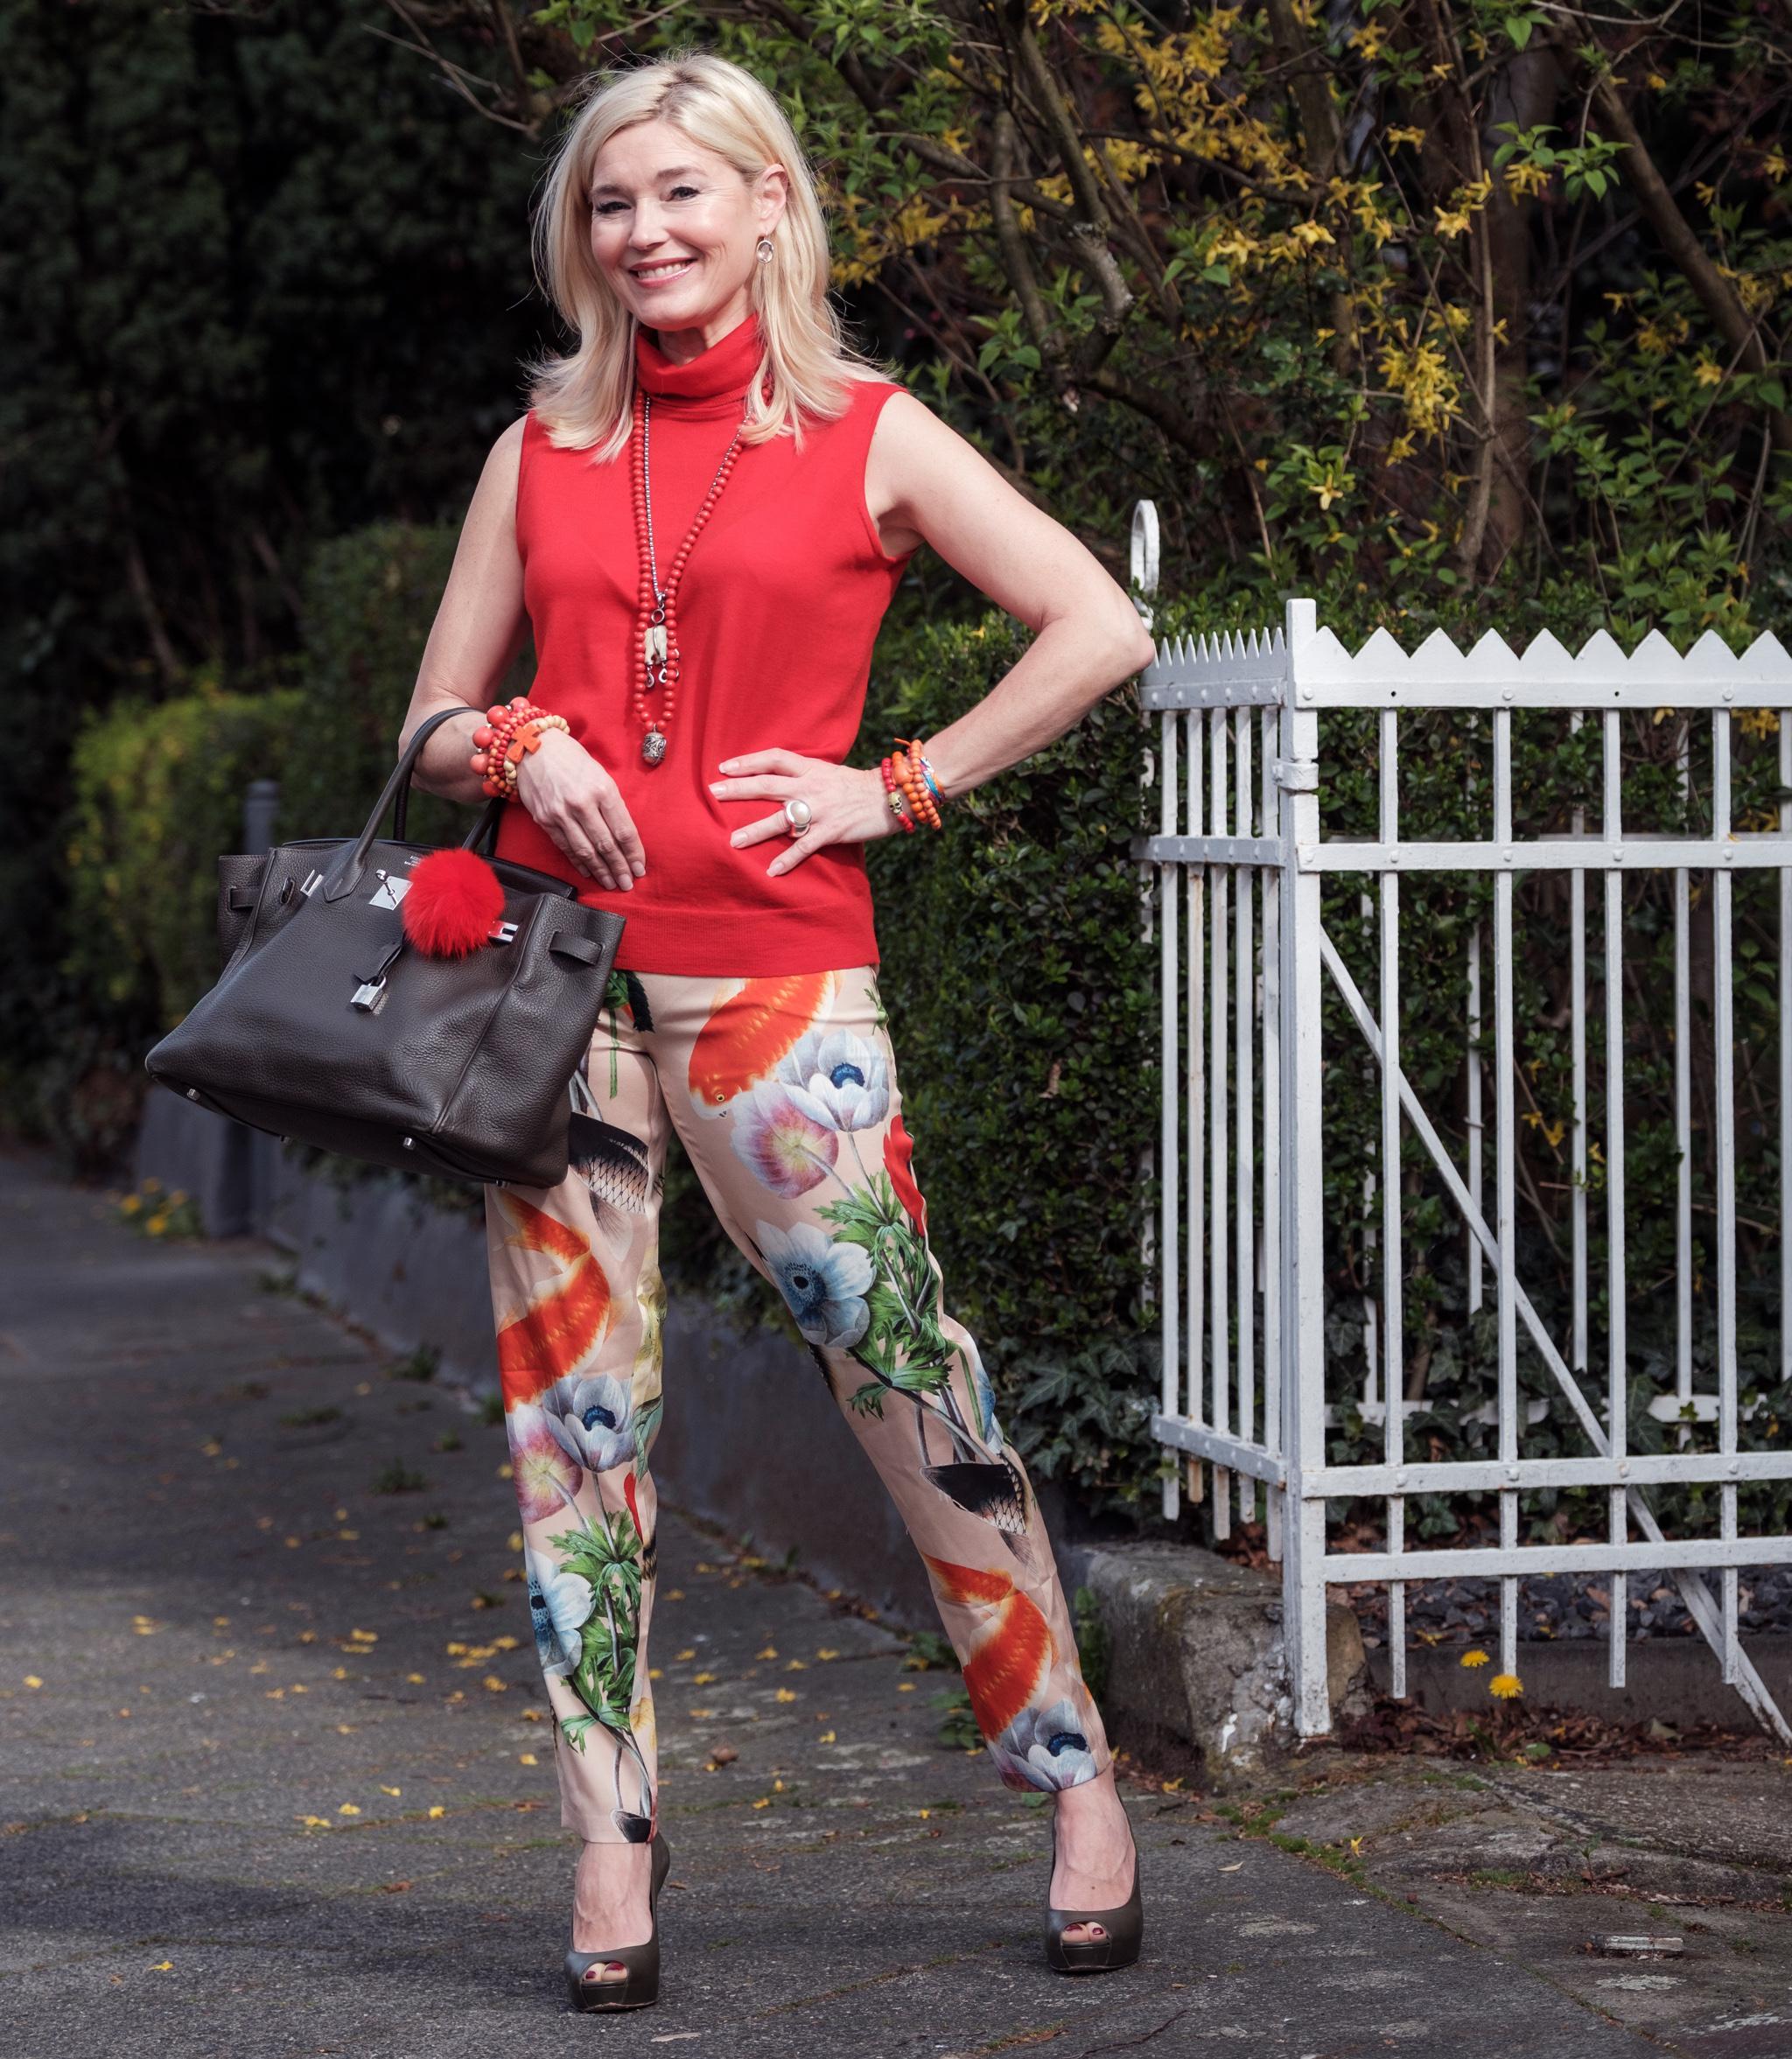 Anni Carlsson Mode, Anni Carlsson Fashion, Anni Carlsson Seidenhose, Seidenstretchhose, gemusterte Seidenhose Goldfische, Fashion-Blog, Lieblingsstil.com, jpg